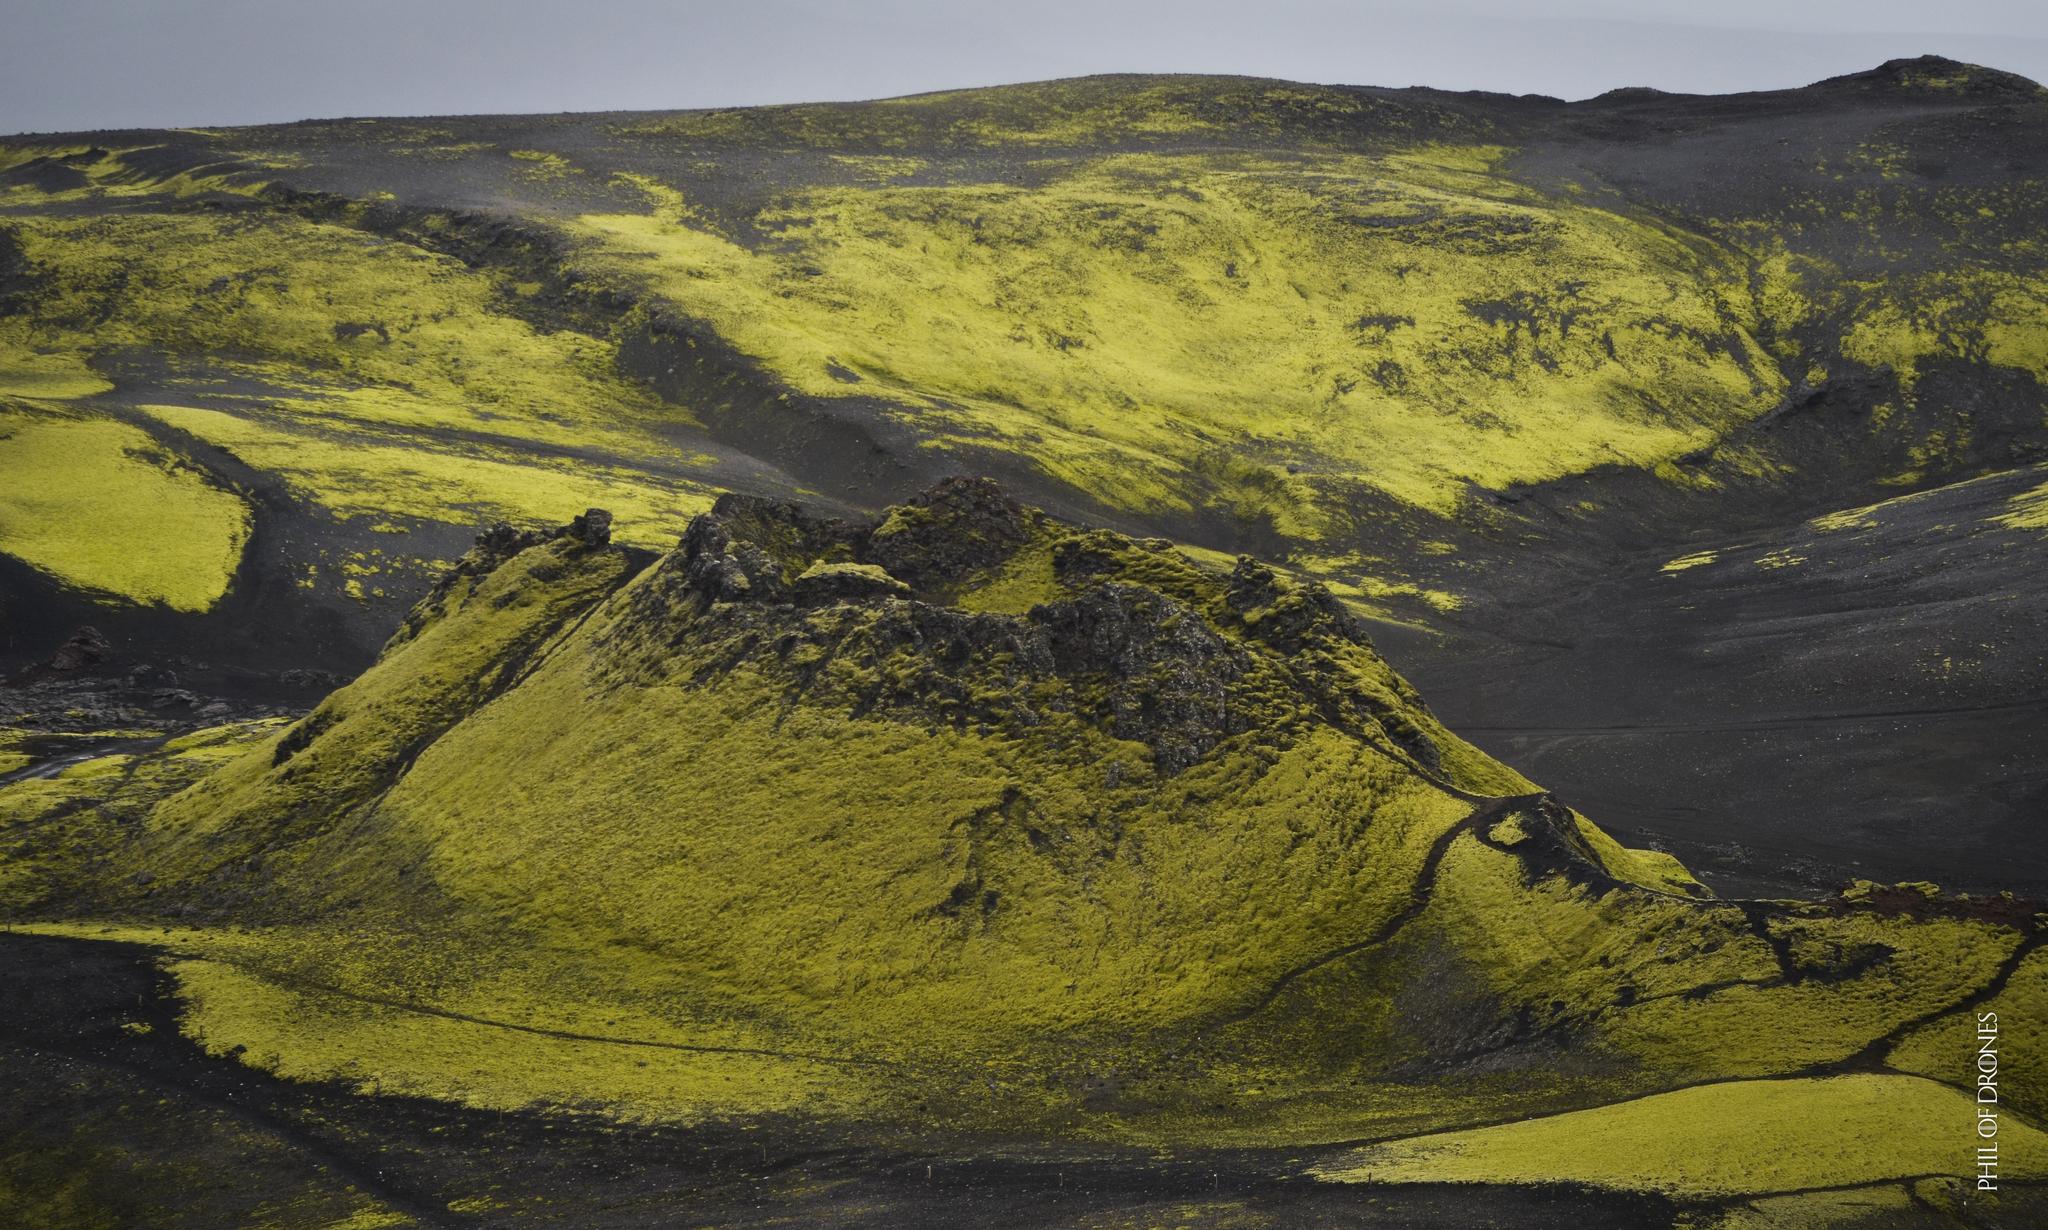 Islande 2013-3-PhM.jpg